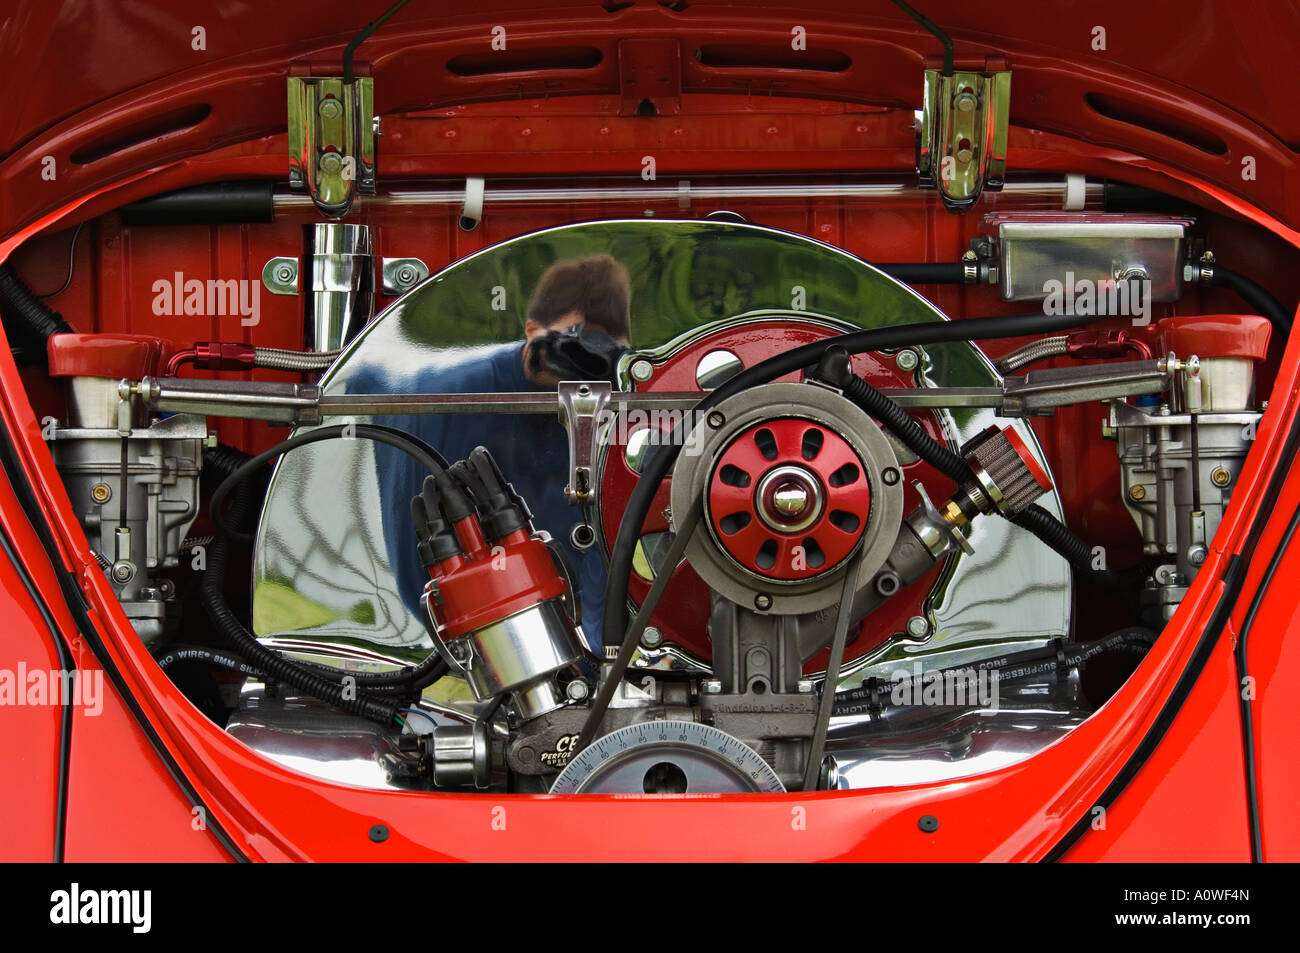 Custom Volkswagen Beetle Engine Stock Photo Royalty Free